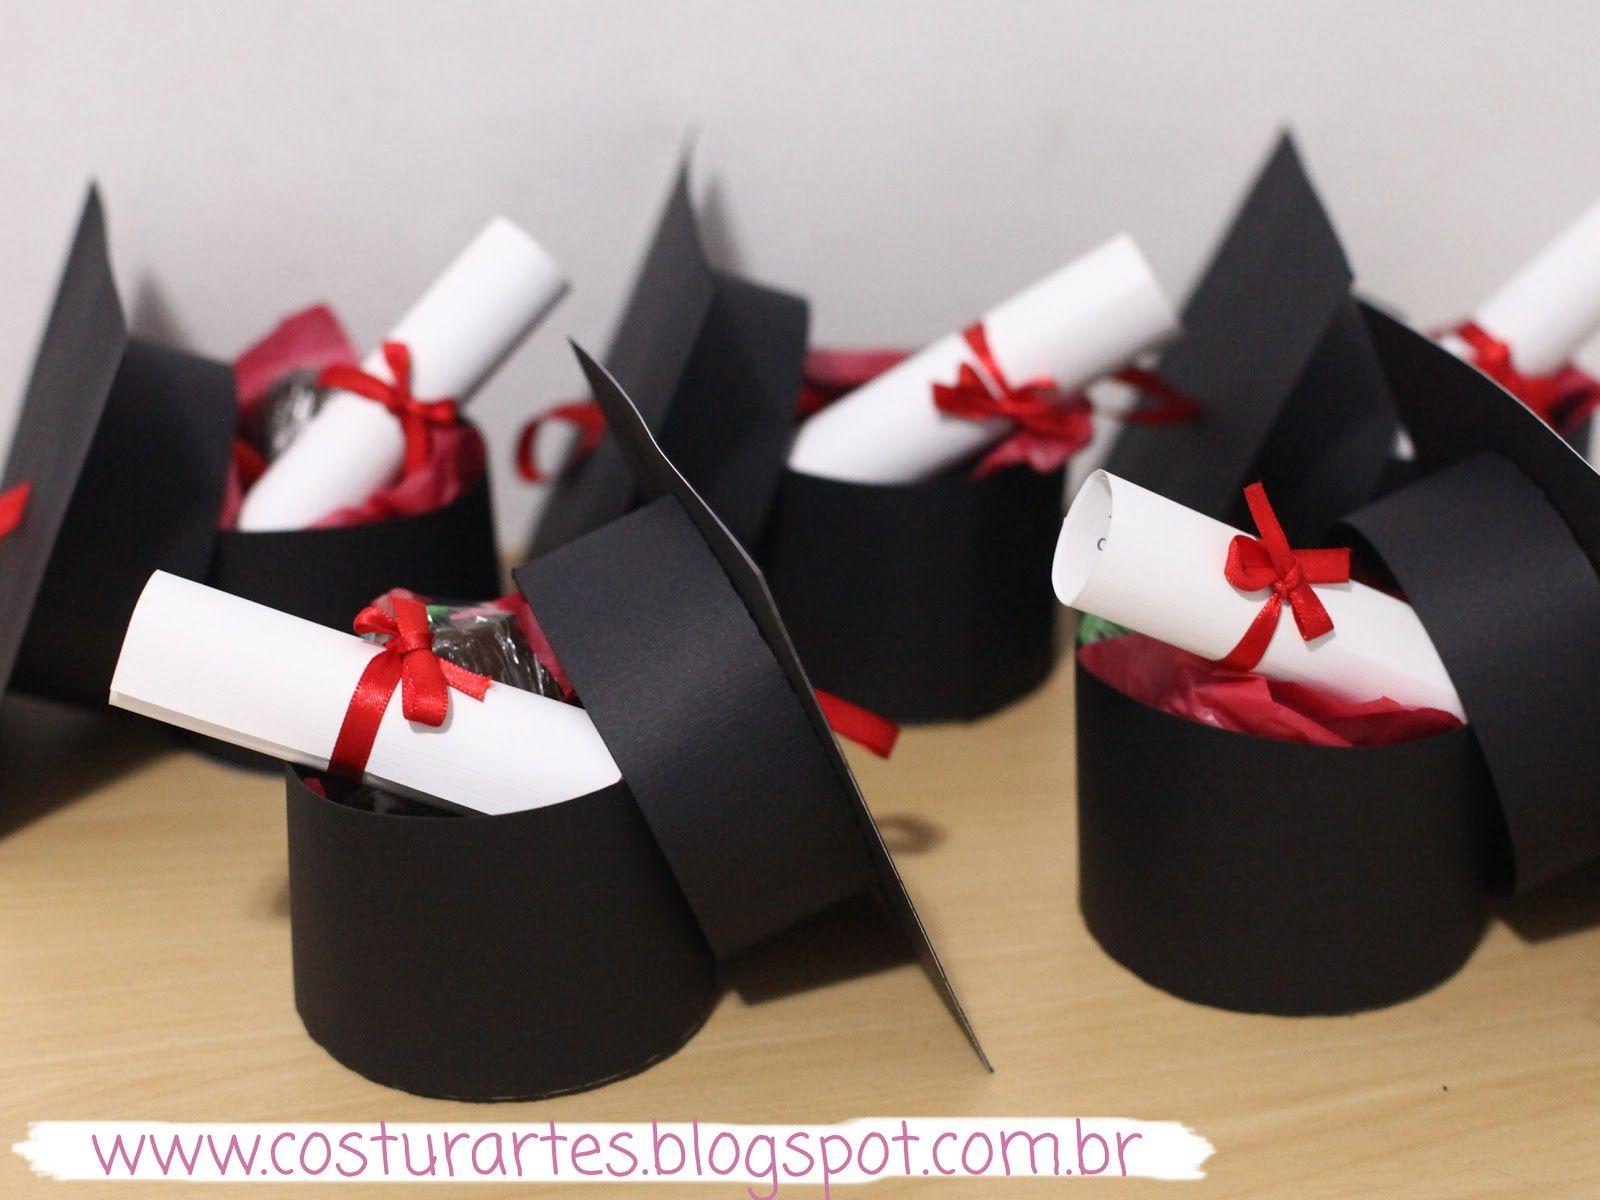 geschenkideen abitur geldgeschenke abschluss. Black Bedroom Furniture Sets. Home Design Ideas